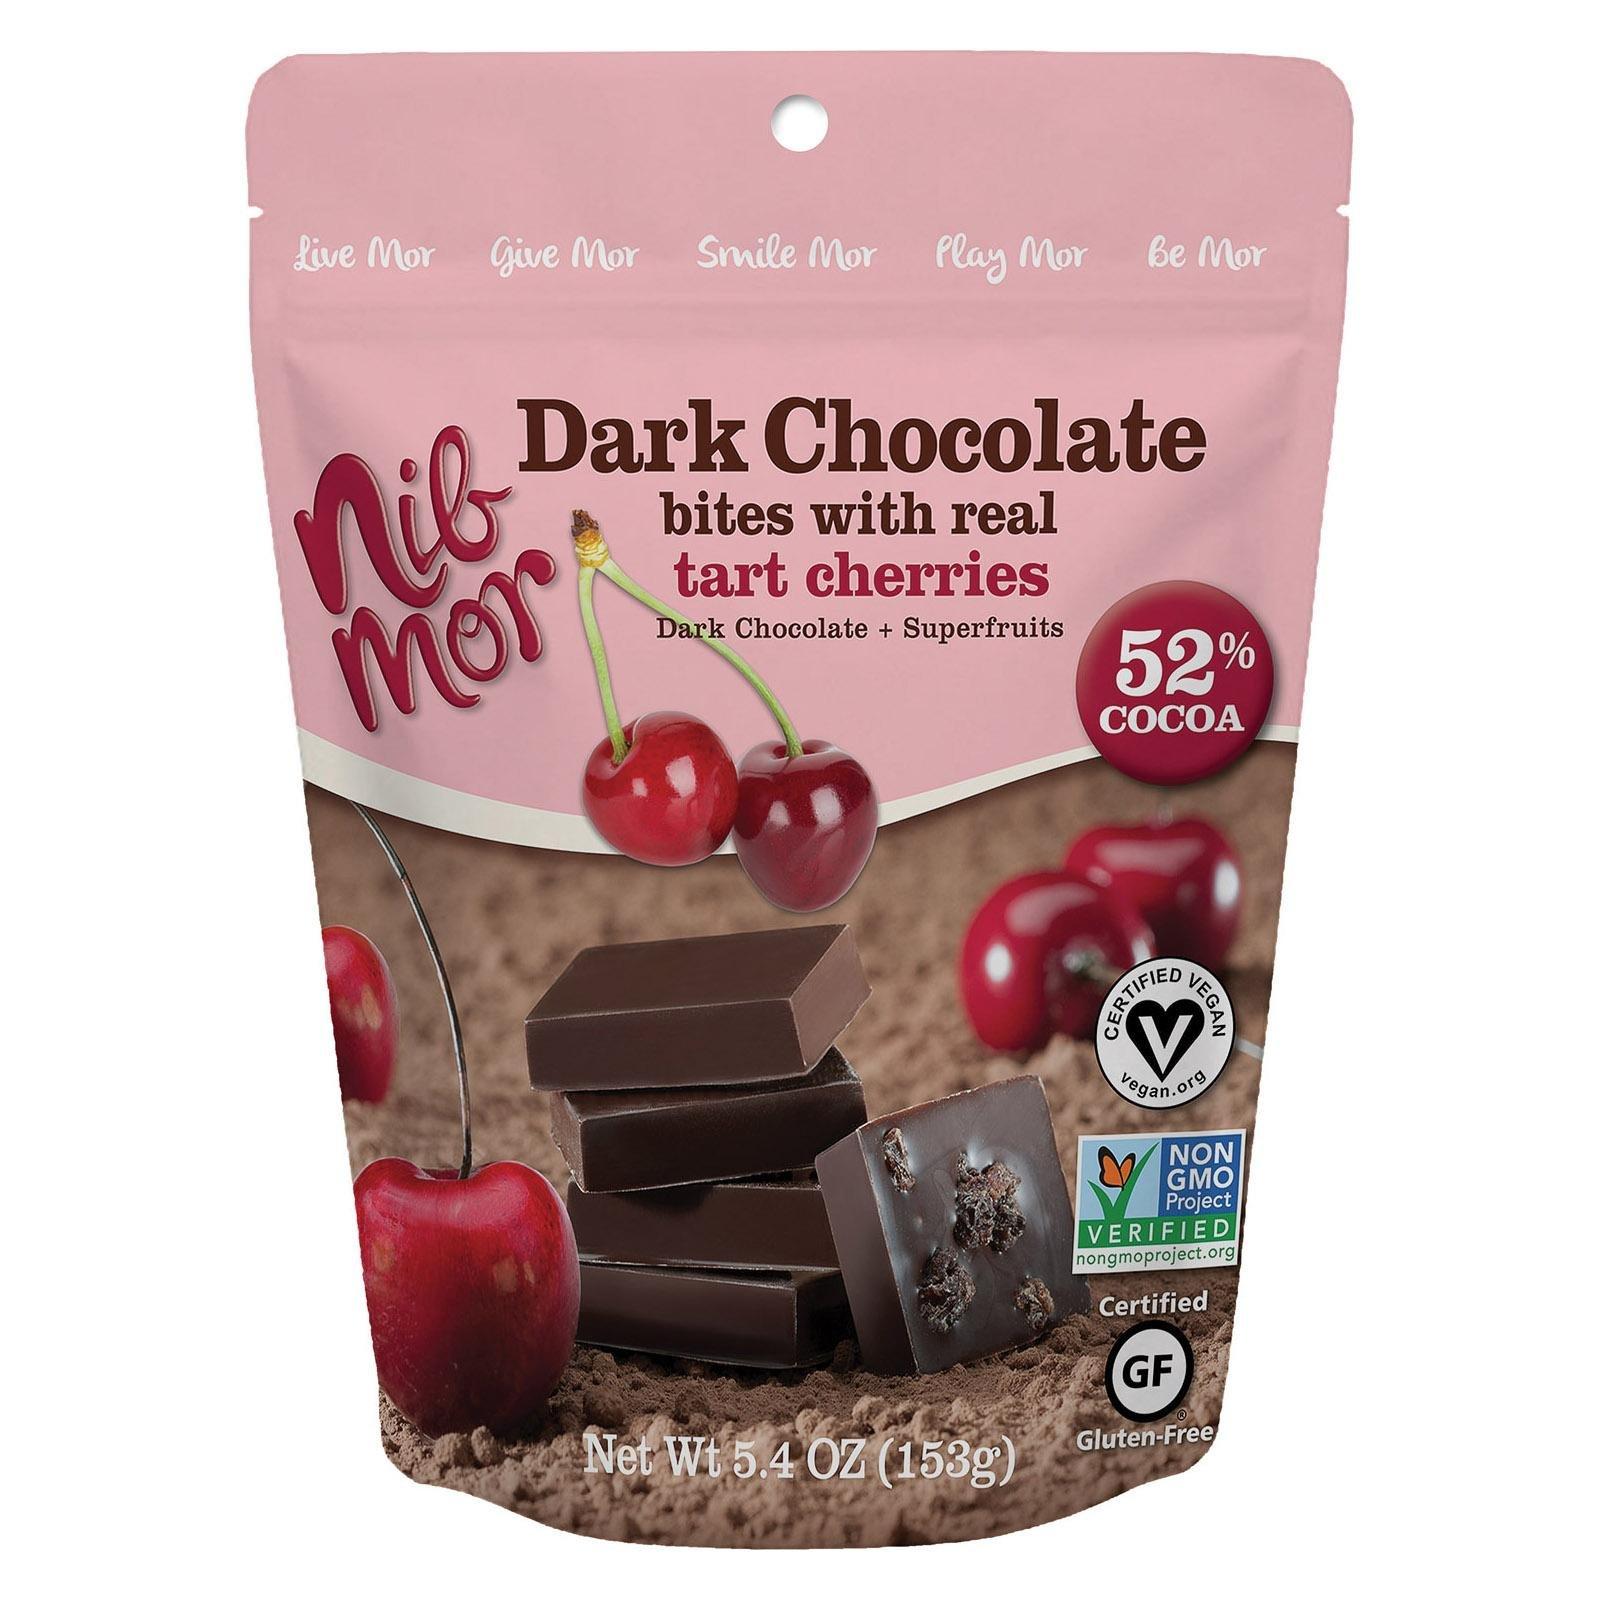 NibMor All Natural Dark Chocolate Bites with Real Tart Cherries - Pack of 6